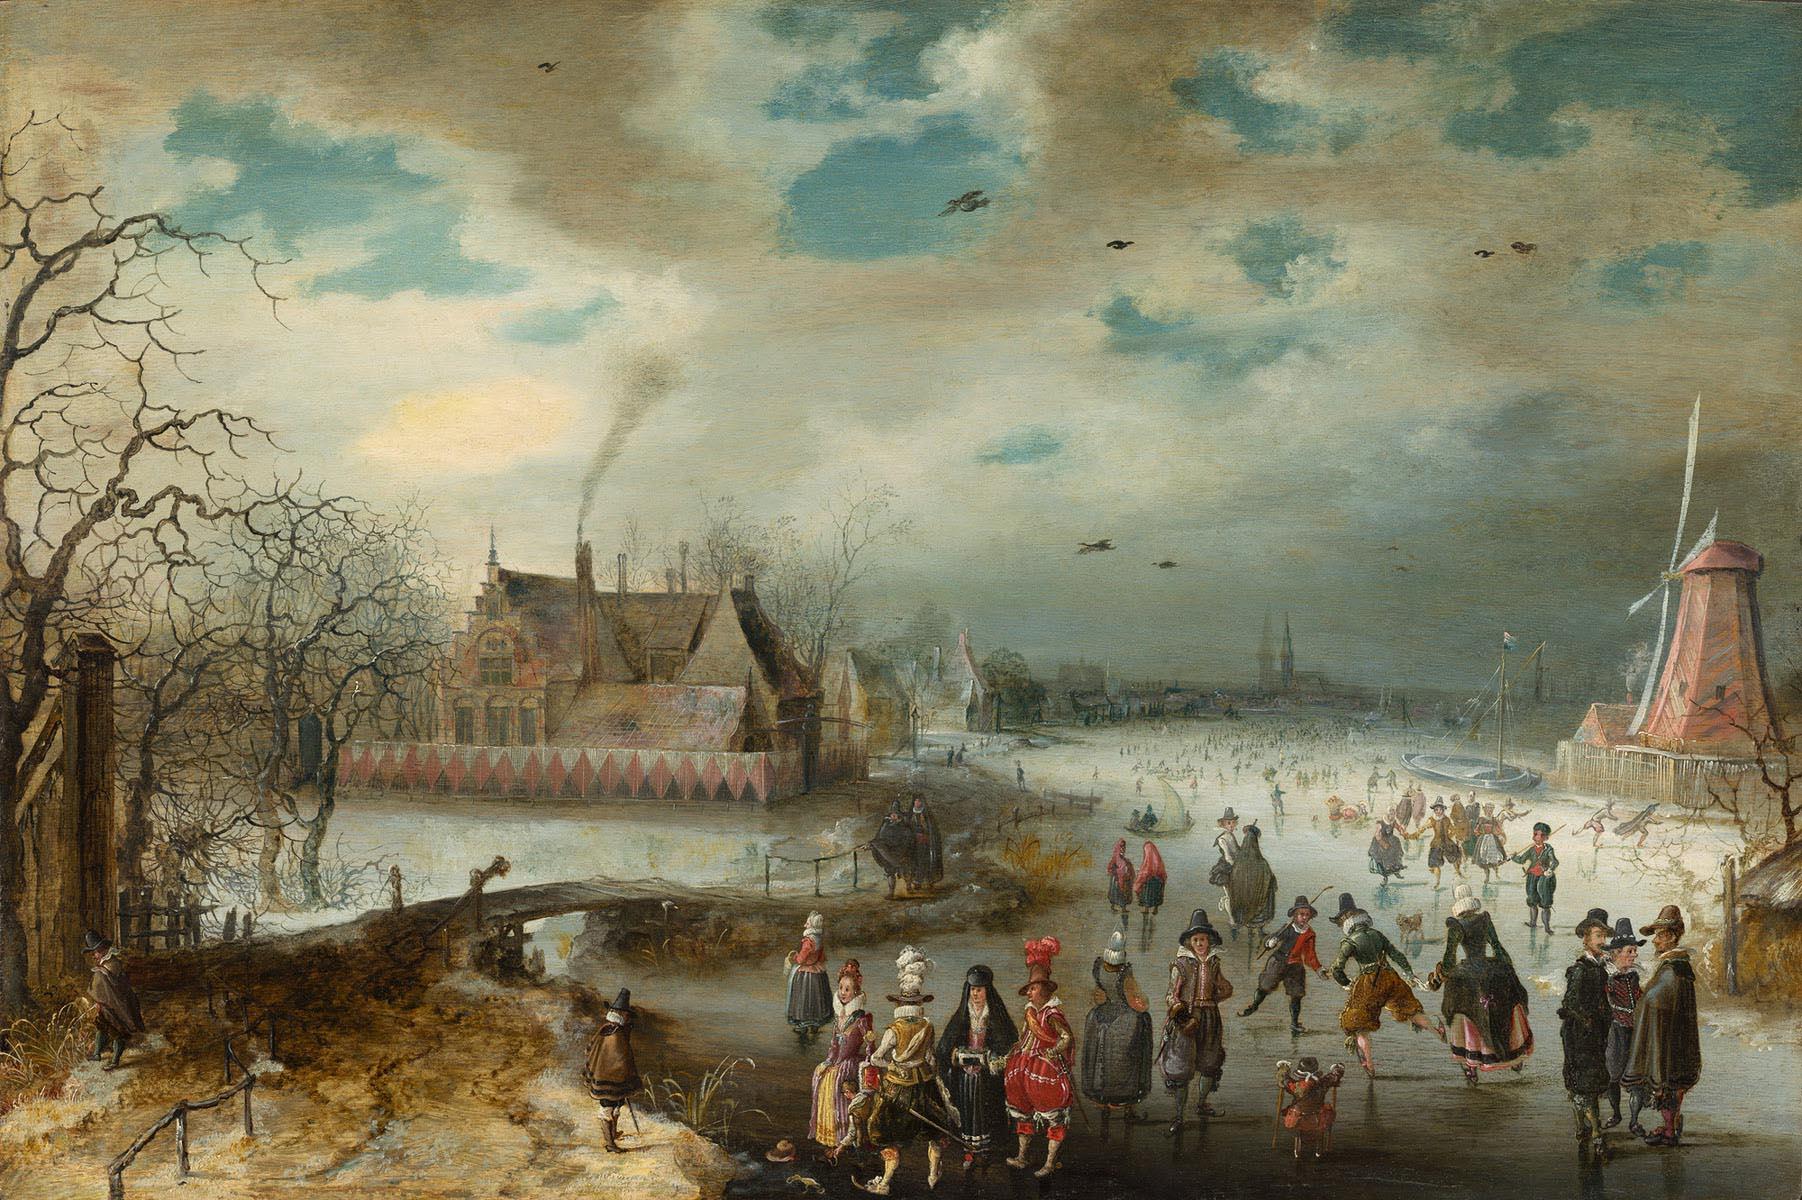 Adam van Breen (Dutch, c. 1585 - 1640 ), Skating on the Frozen Amstel River, 1611, oil on panel, The Lee and Juliet Folger Fund, in honor of Arthur K. Wheelock, Jr.